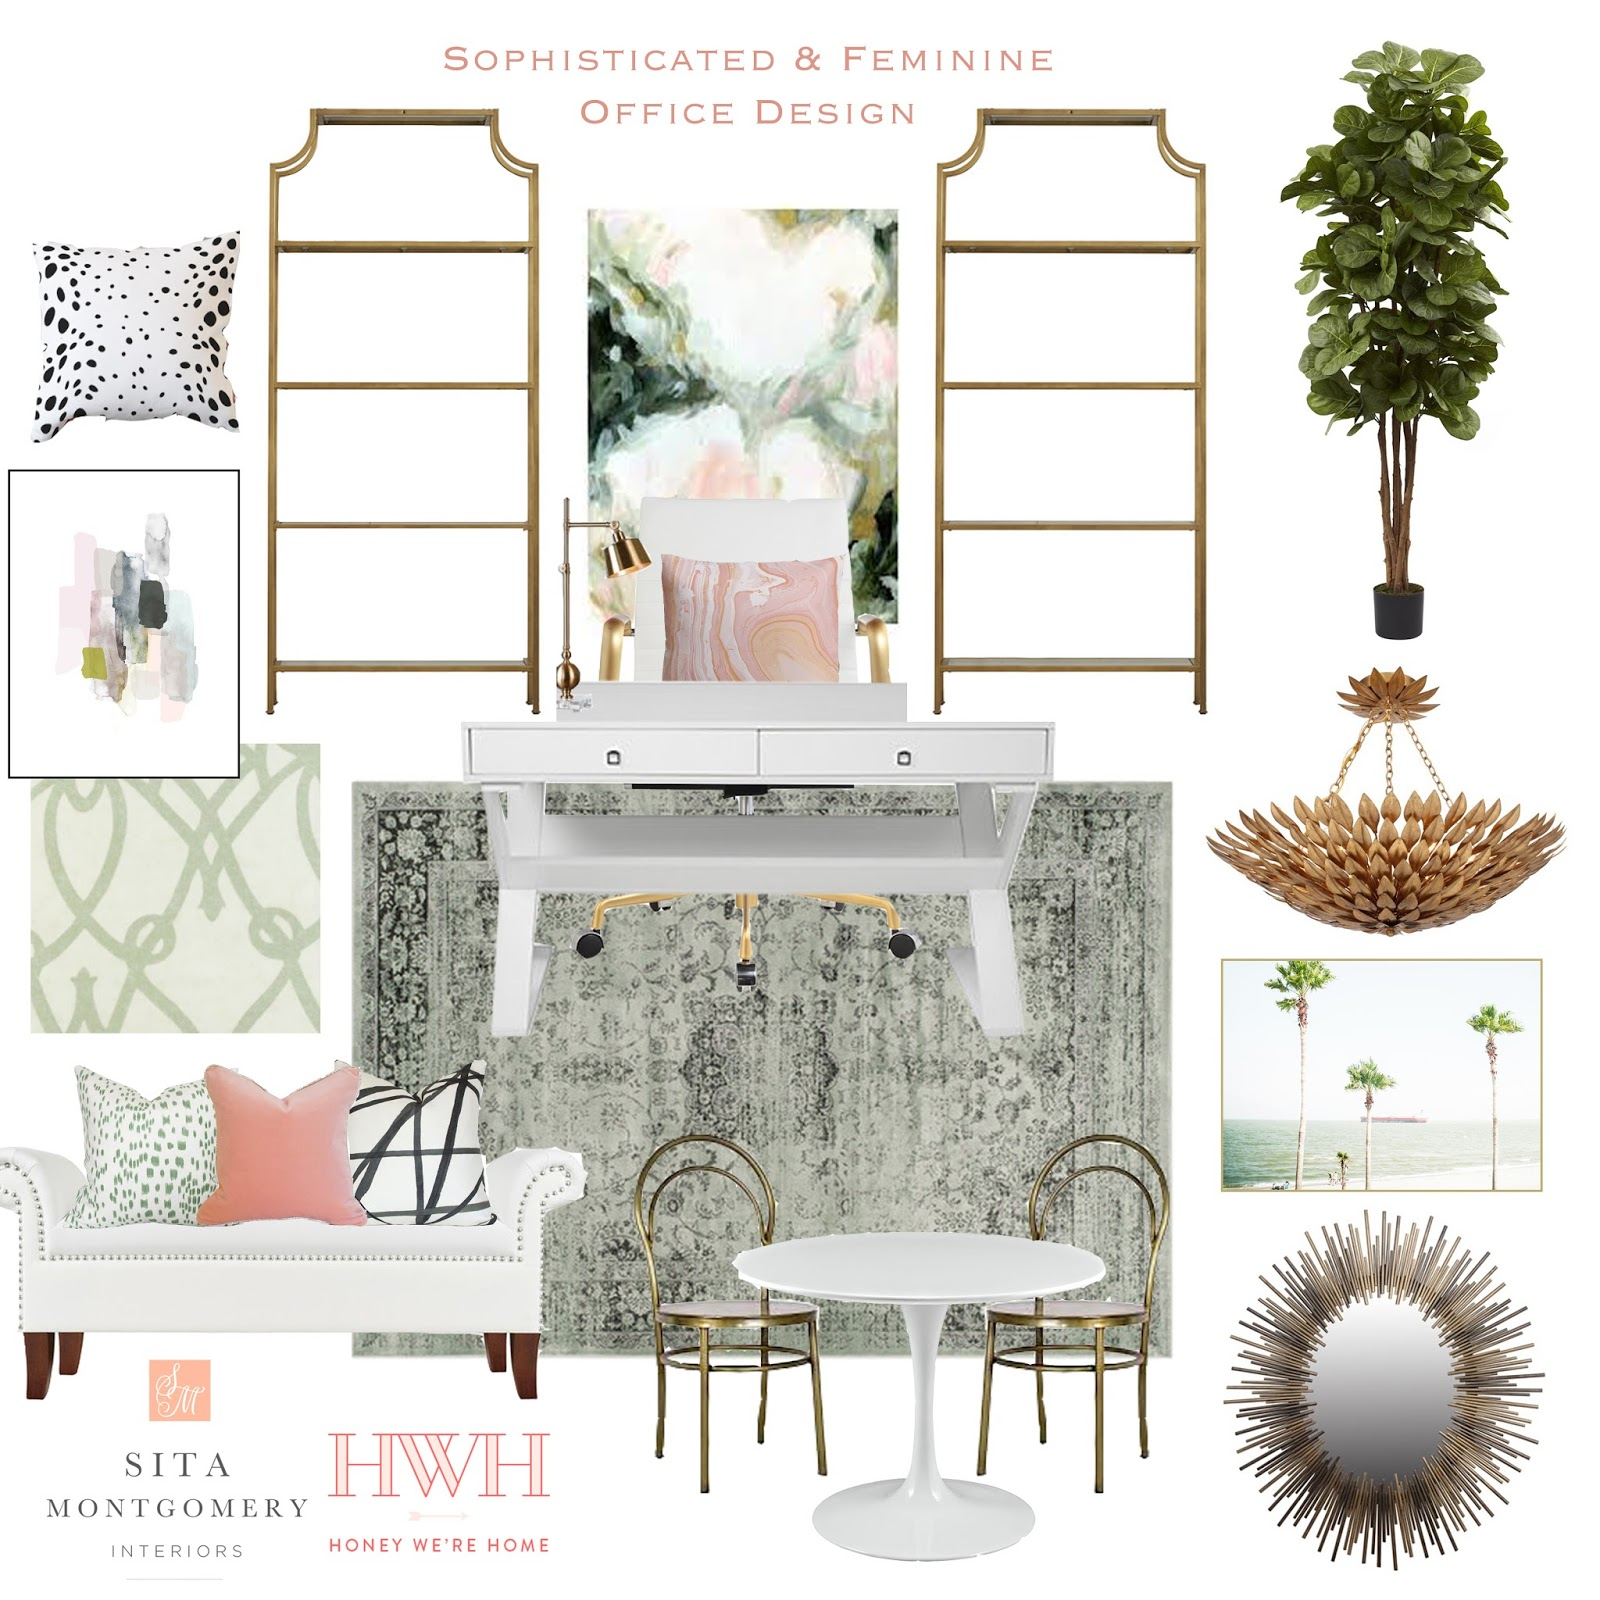 Sophisticated And Feminine Office Design Board Sita